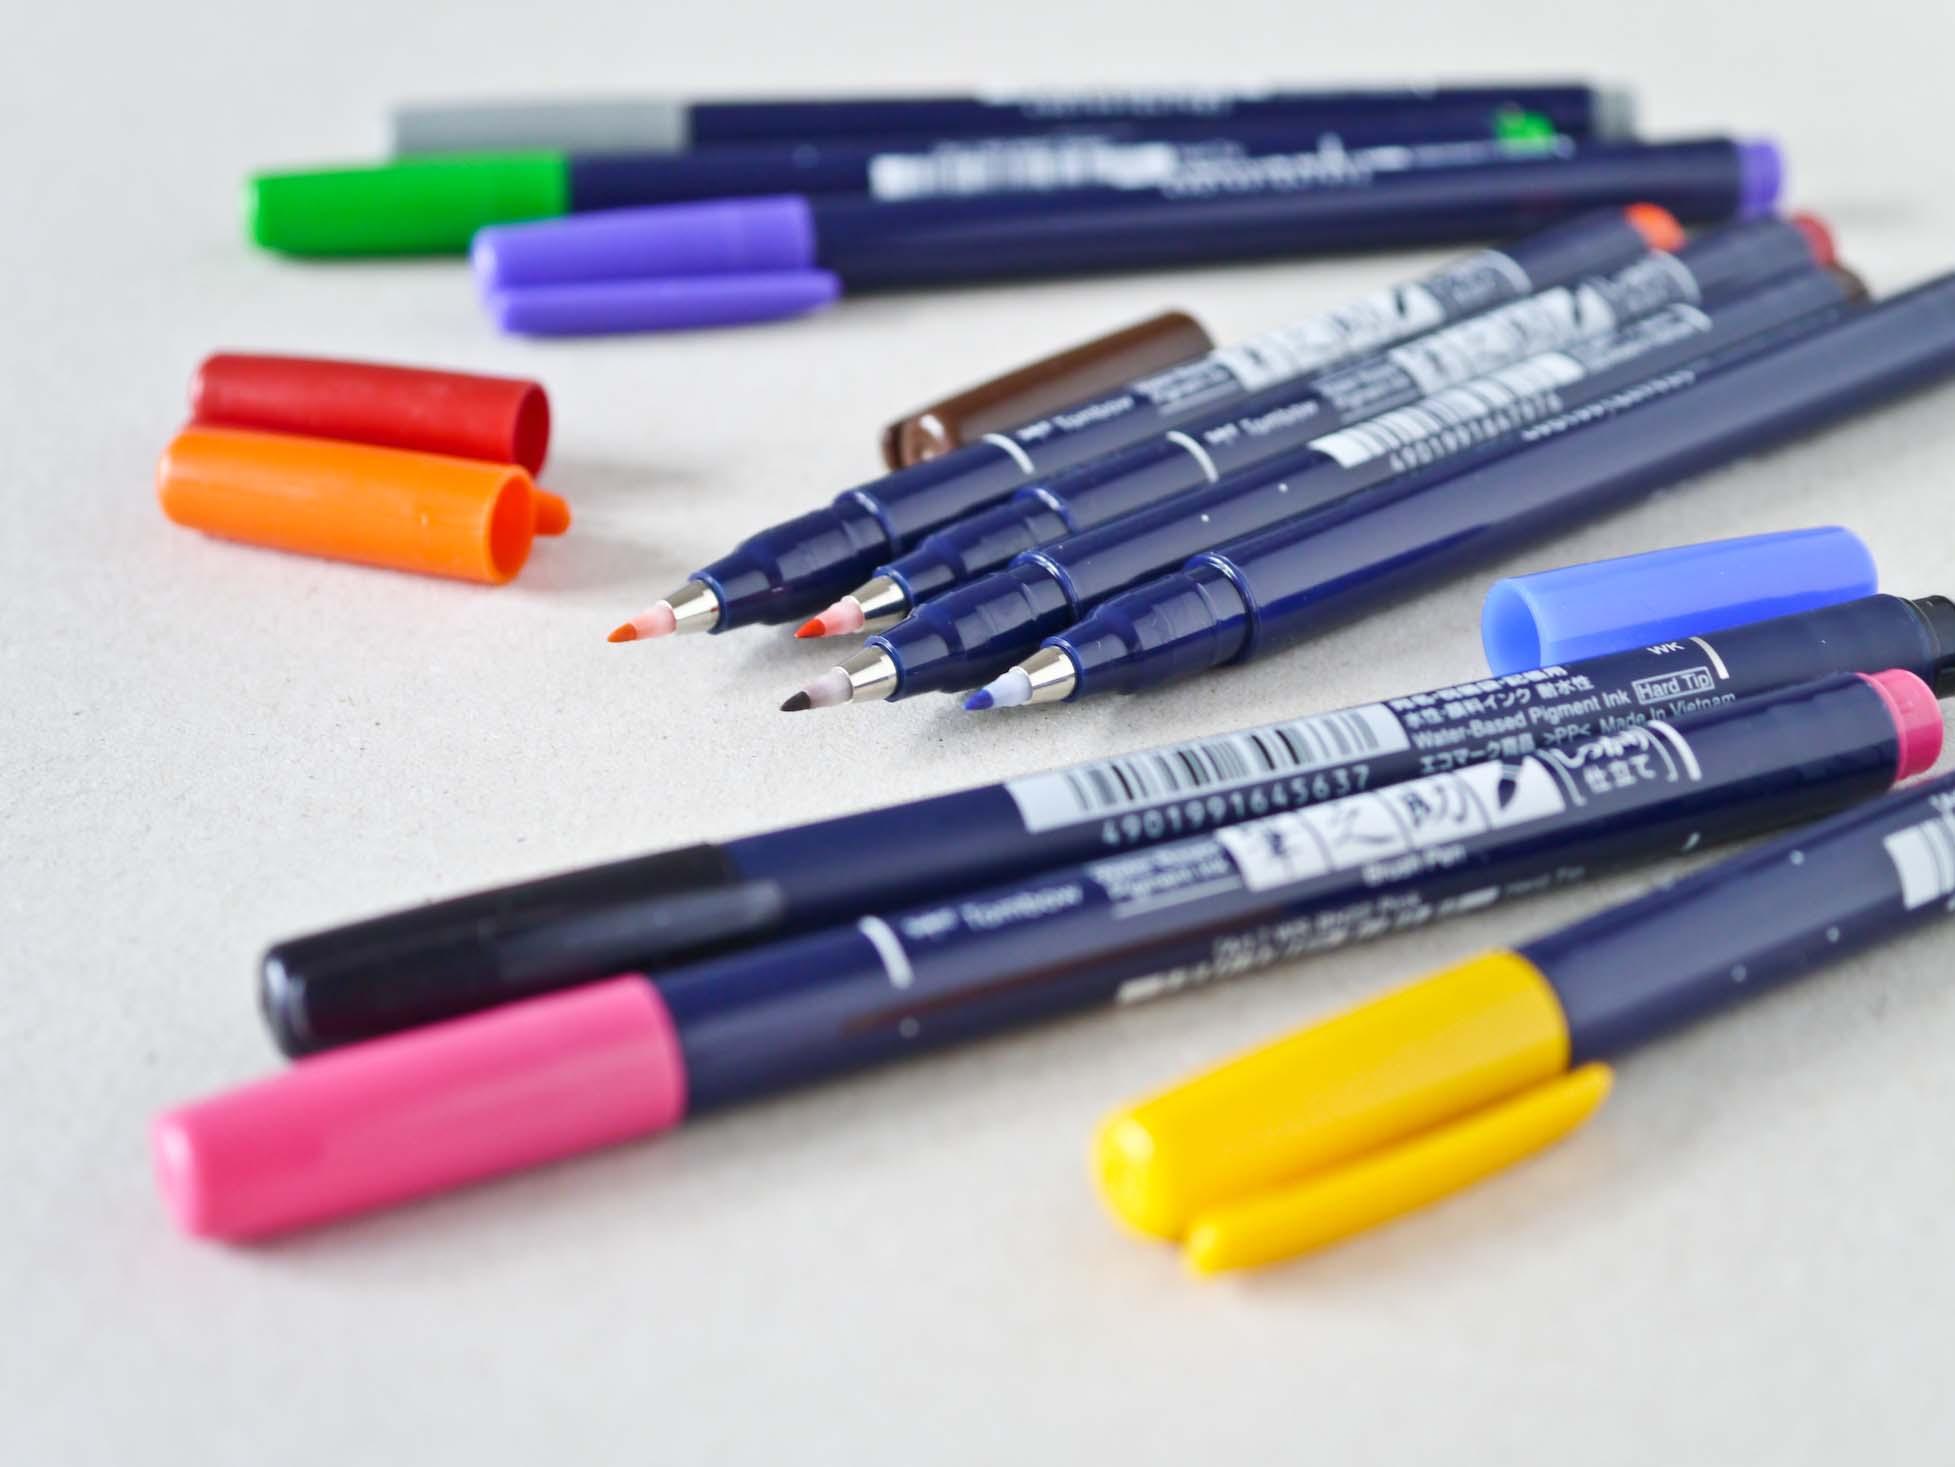 Tombow Fudenosuke farvede penne